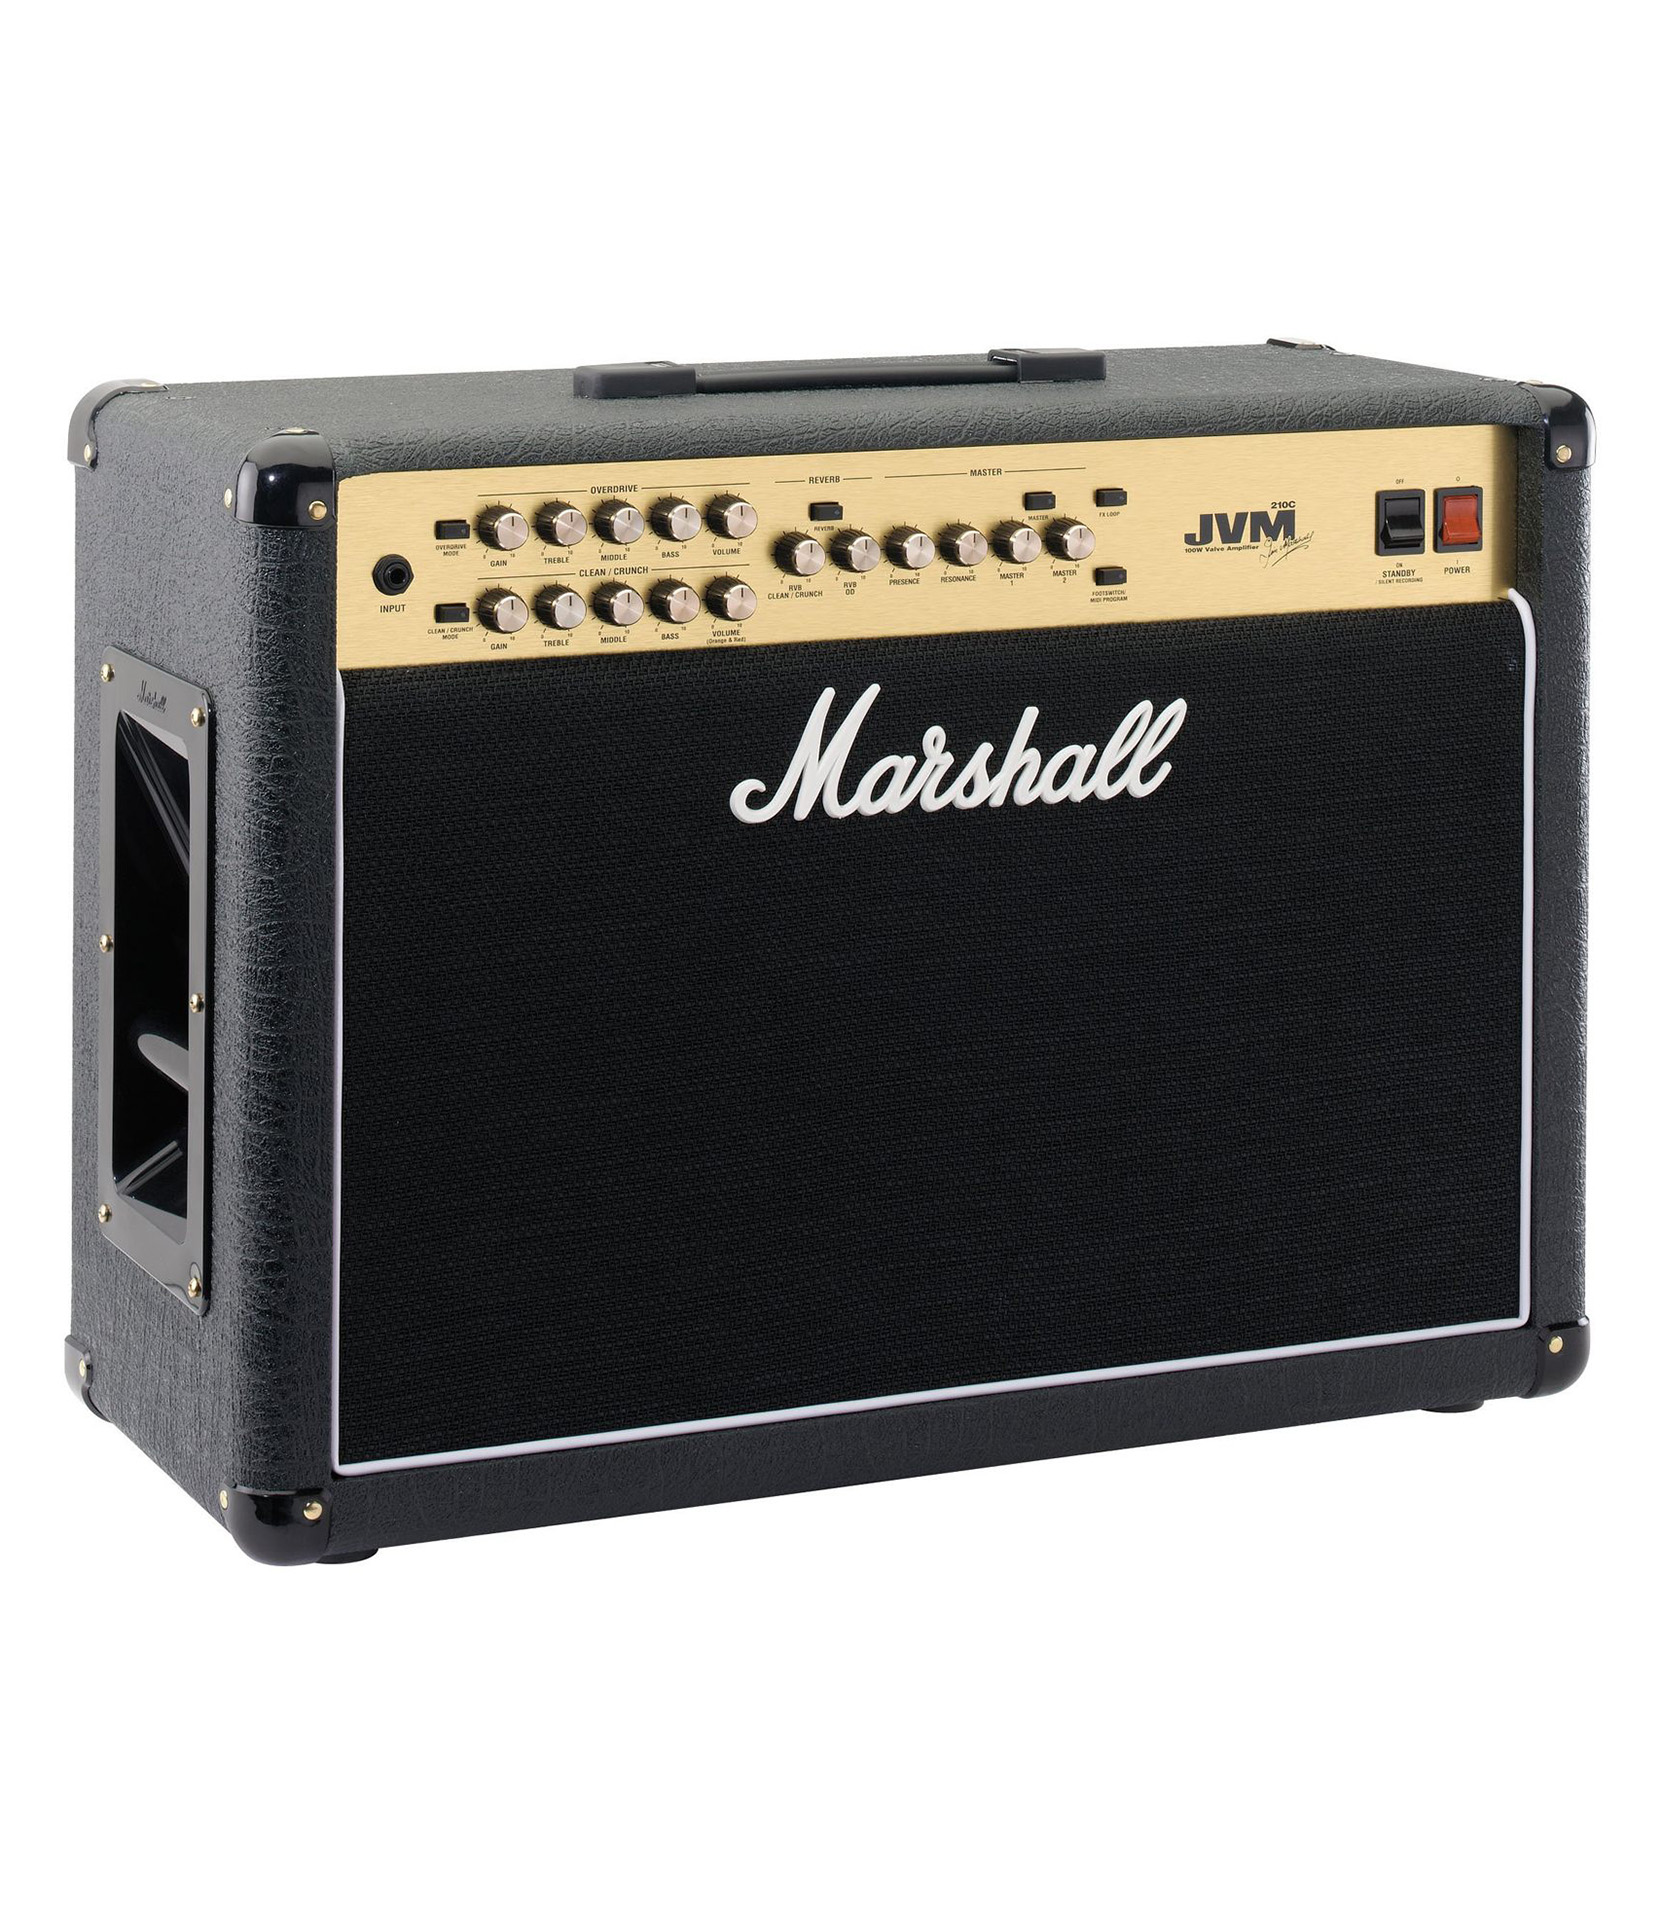 buy marshall jvm 210ctube guitar amp 2 channel